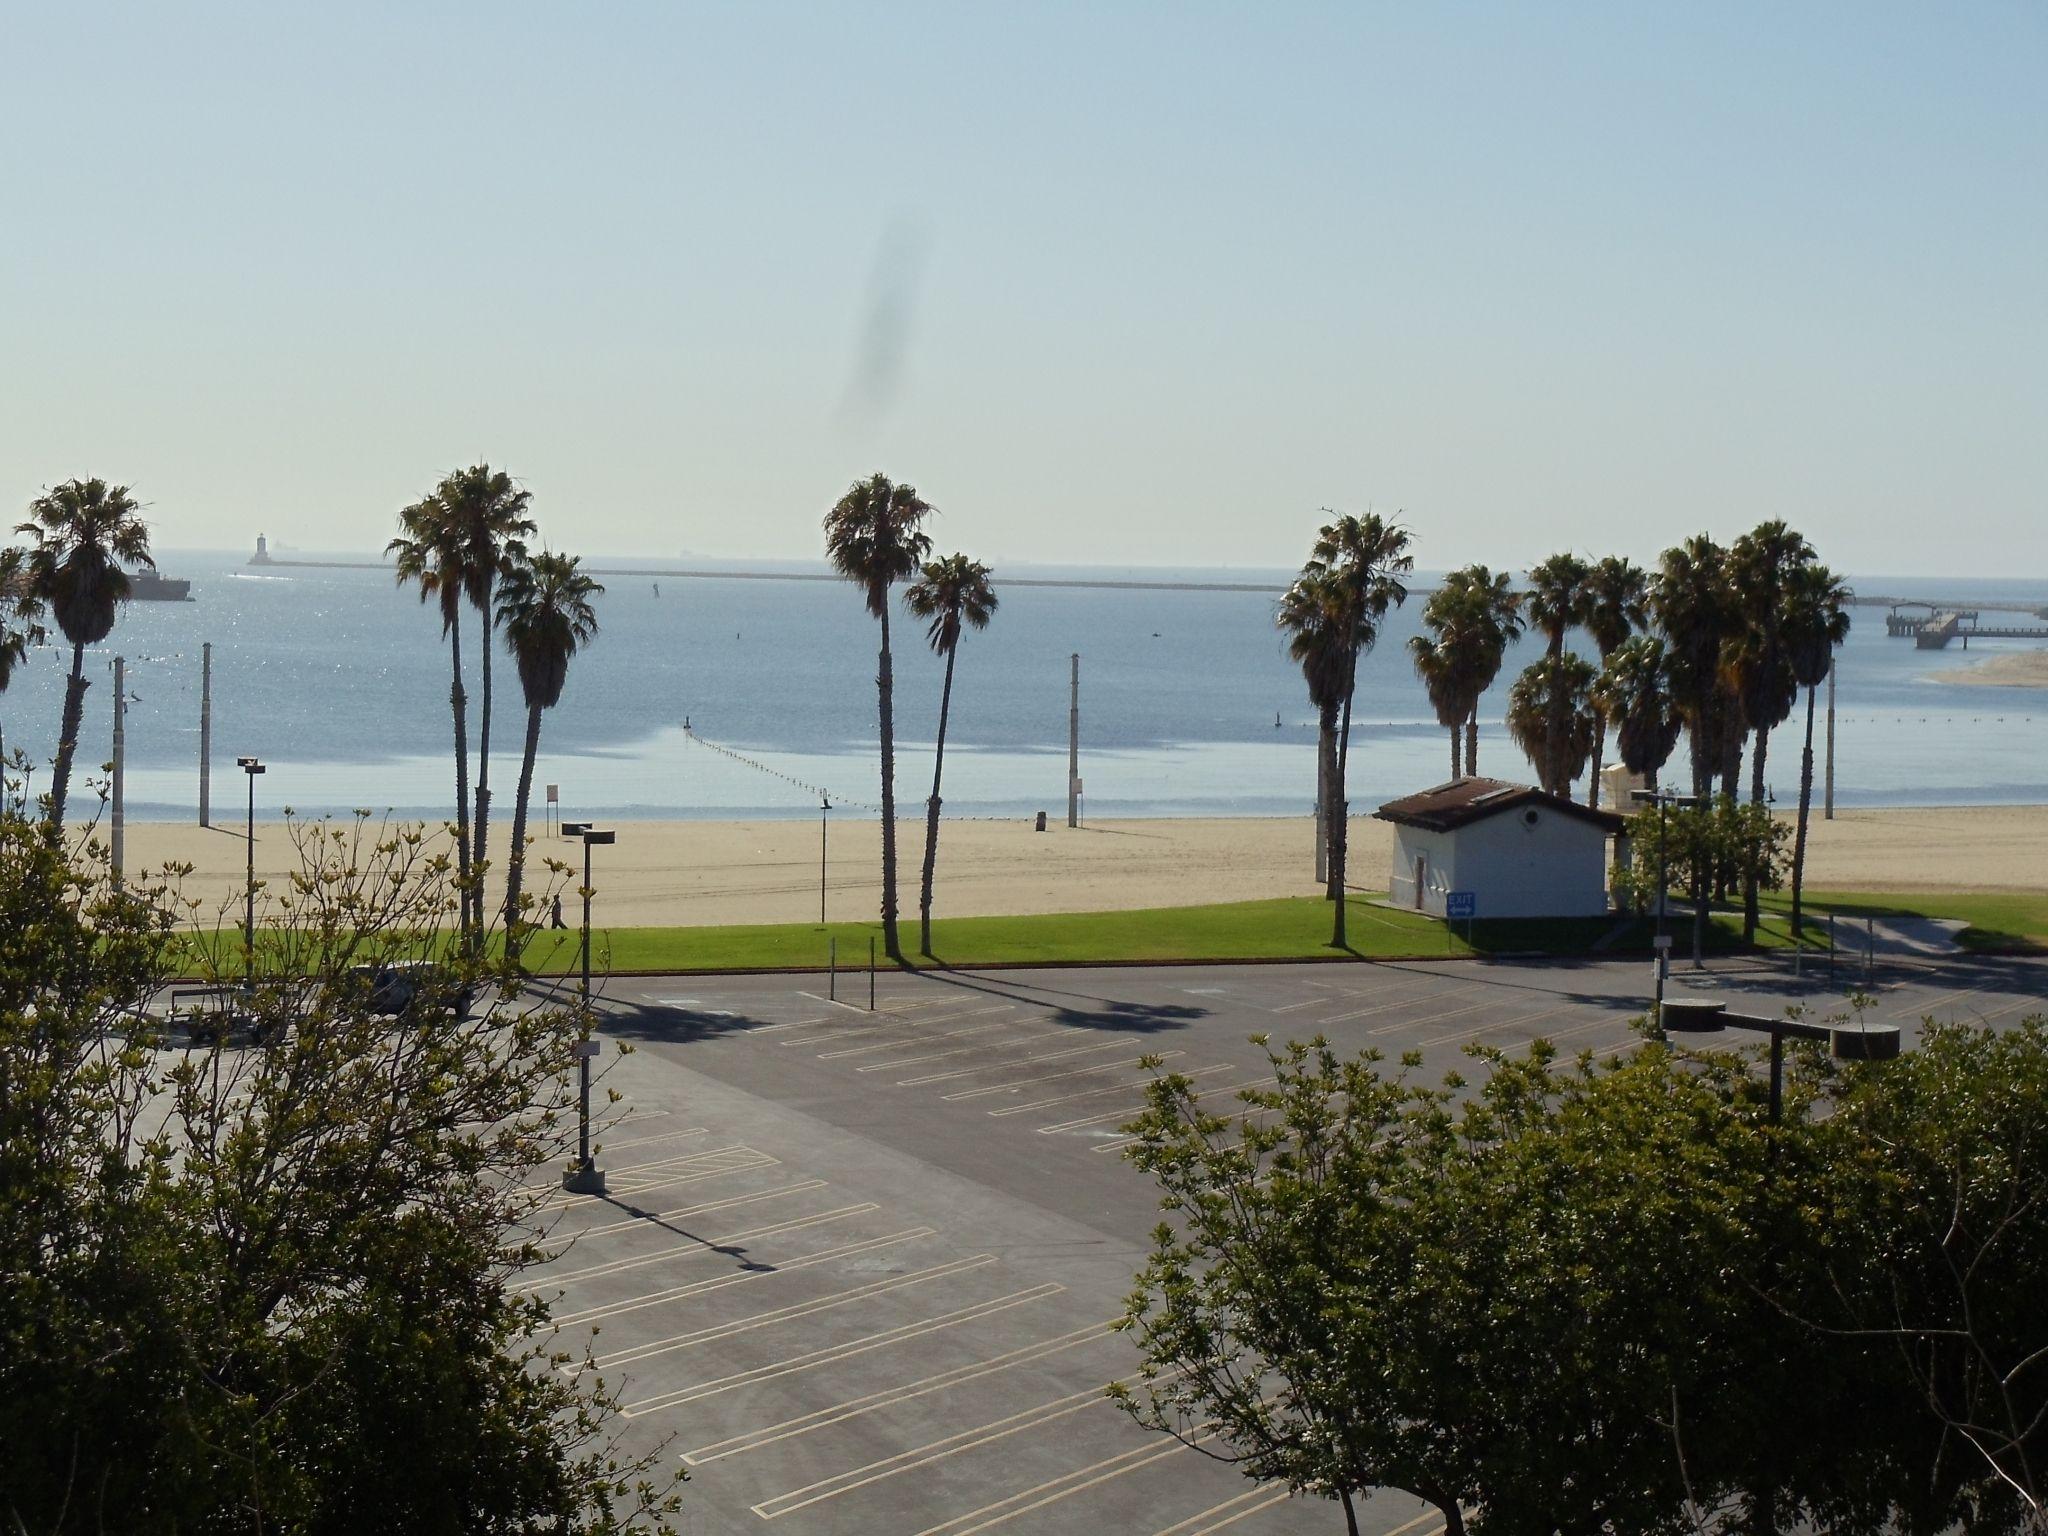 Beach View Home Rentals Beach View San Pedro Los Angeles San Pedro